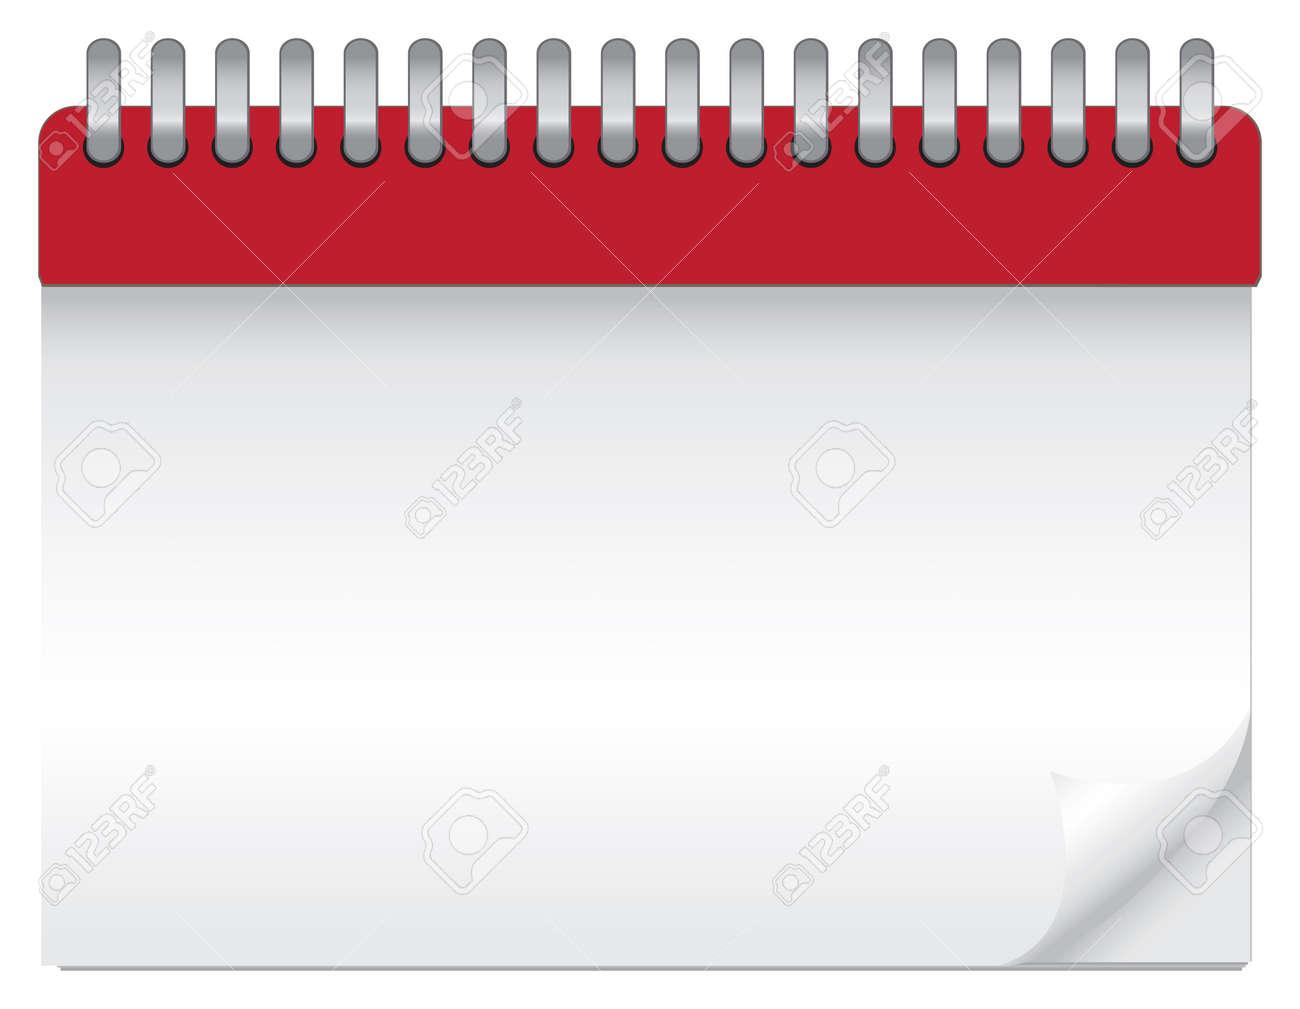 Blank Calendar Icon Vector - More information - plumbershelp.info